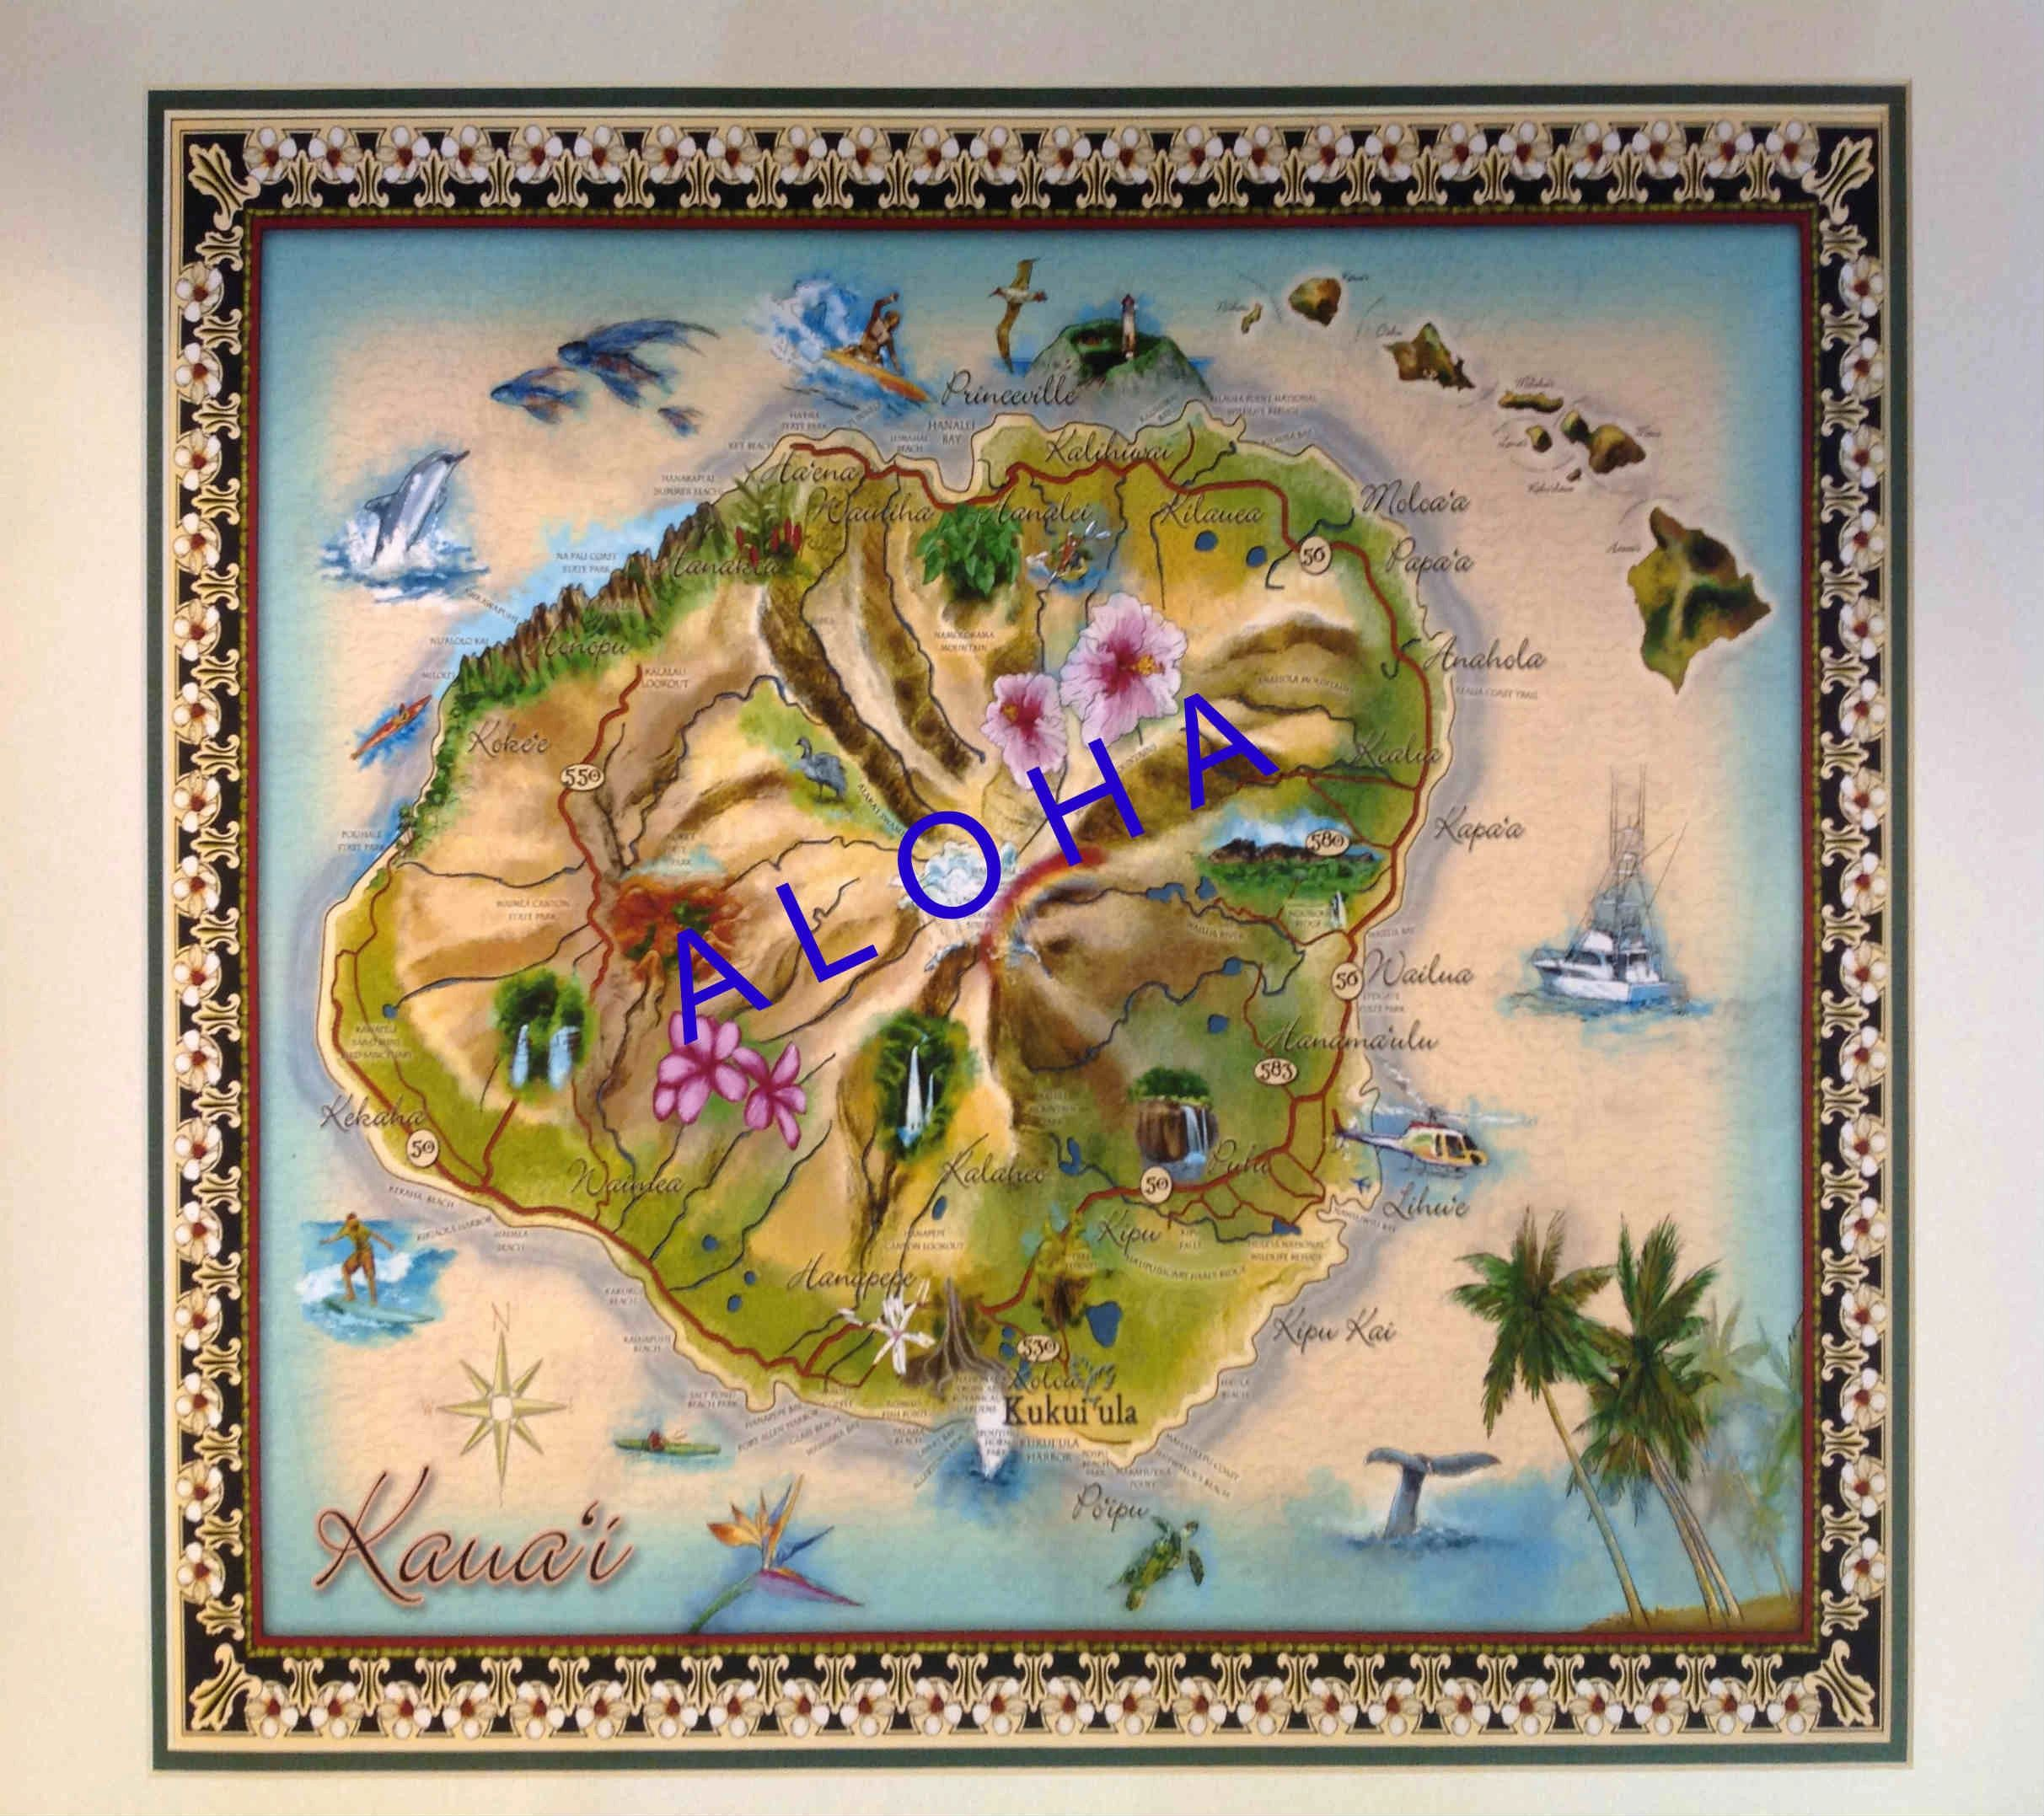 Kauai Fine Arts Hawaiian Products Maps Prints